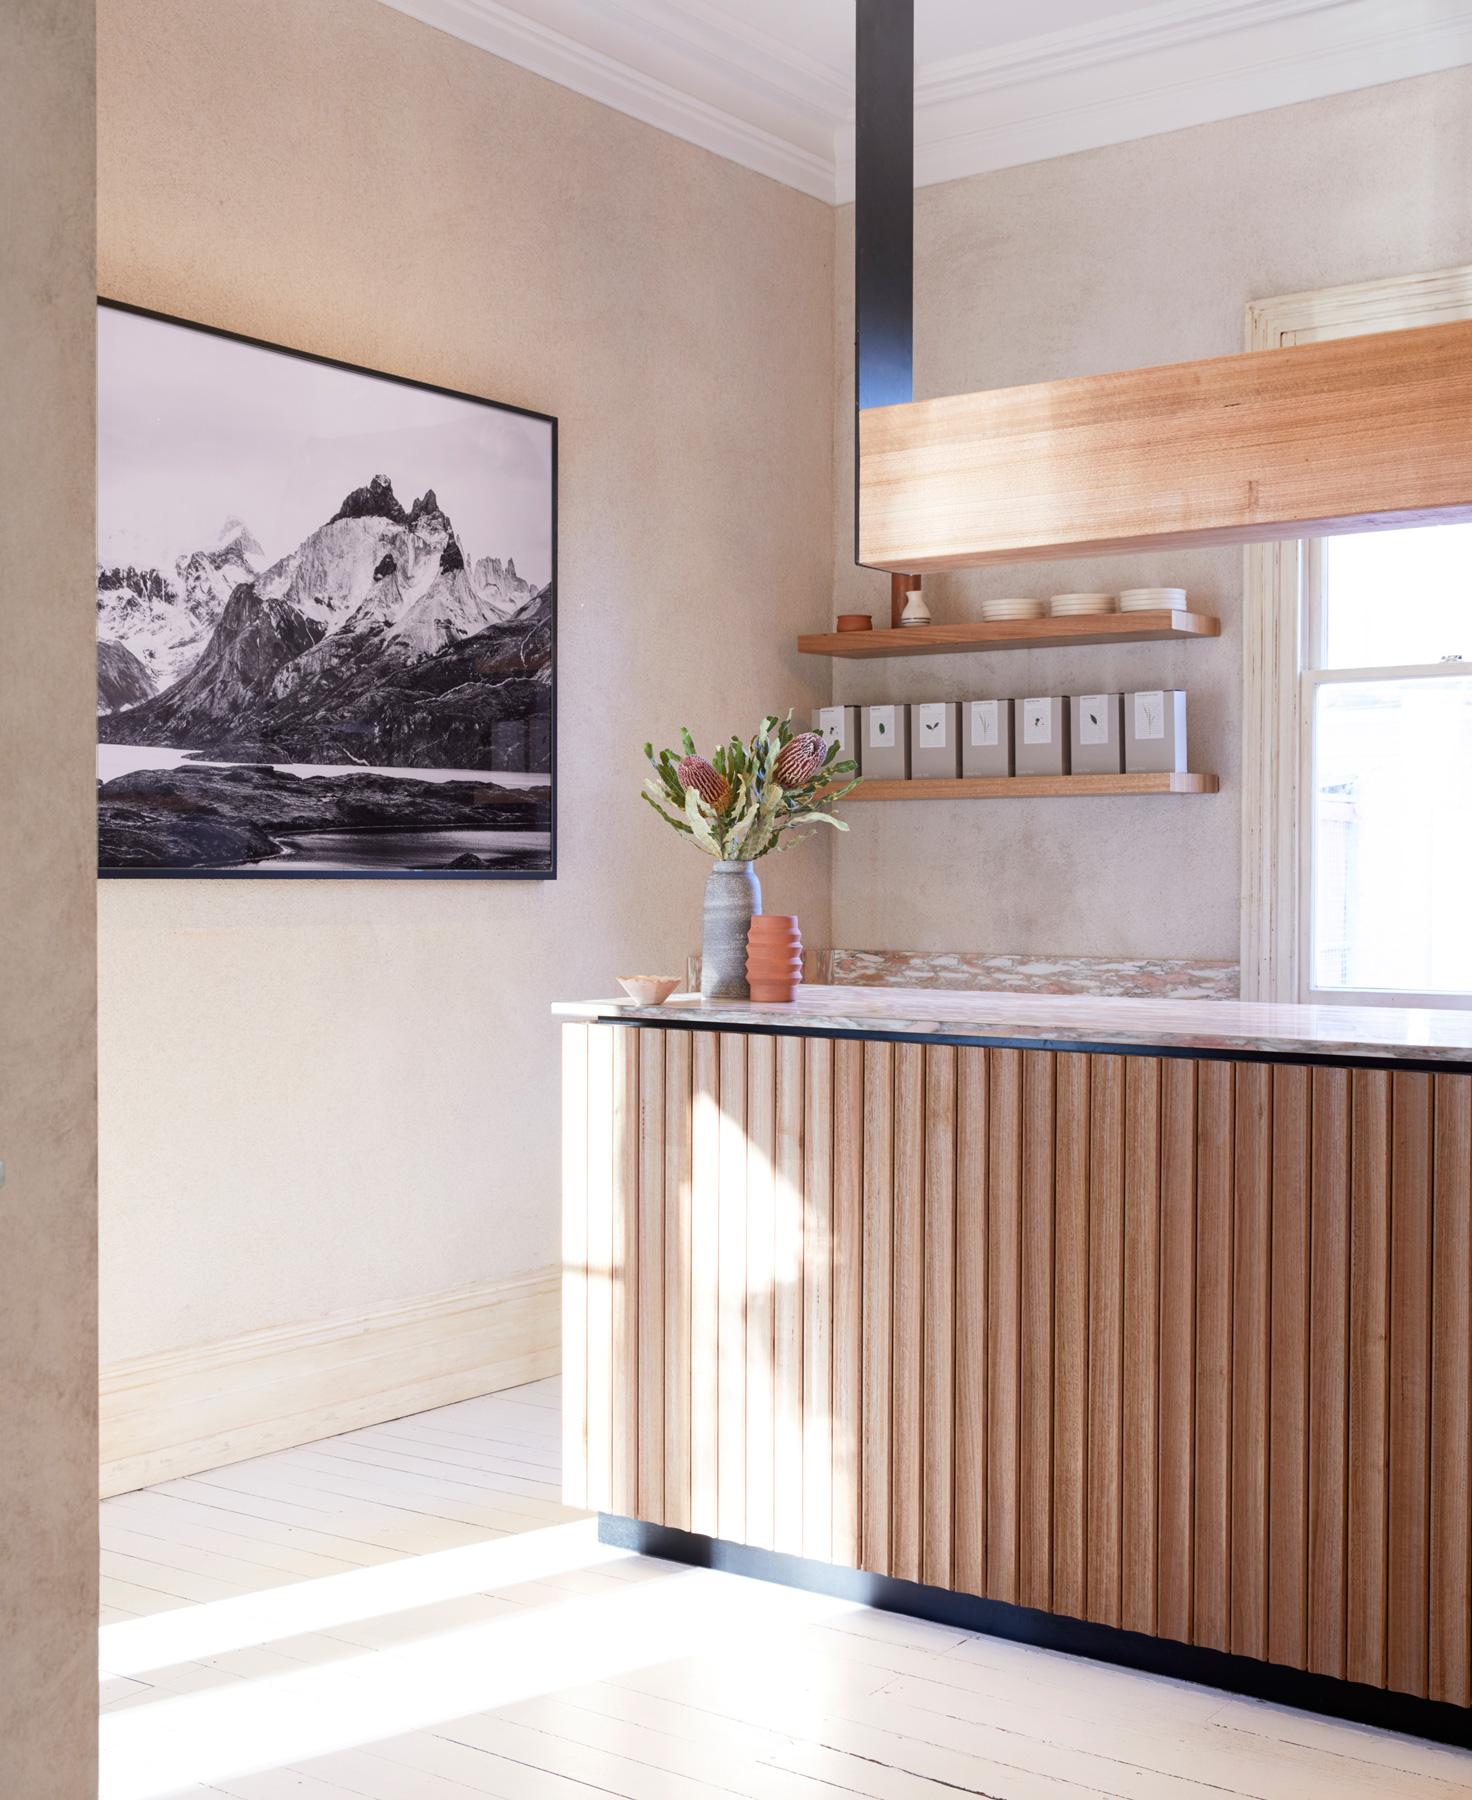 Percy Plunkett Cafe - Killing Matt Woods - Interior Design - Hospitality